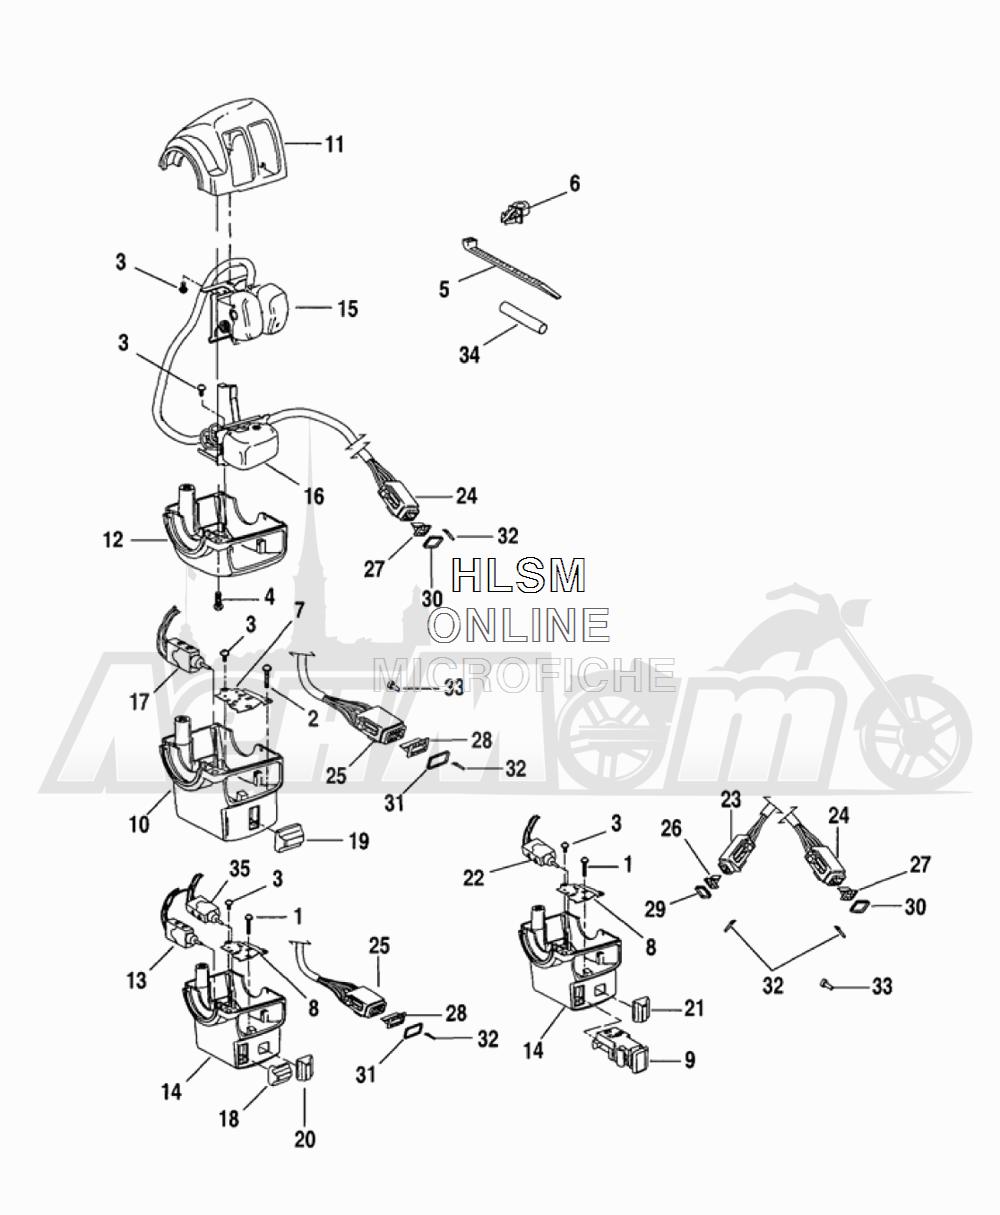 Запчасти для Мотоцикла Harley-Davidson 2005 FLTRI ROAD GLIDE® (INJECTION) (FS) Раздел: HANDLEBAR SWITCHES - LEFT HAND | руль выключатели, переключатели левая рука